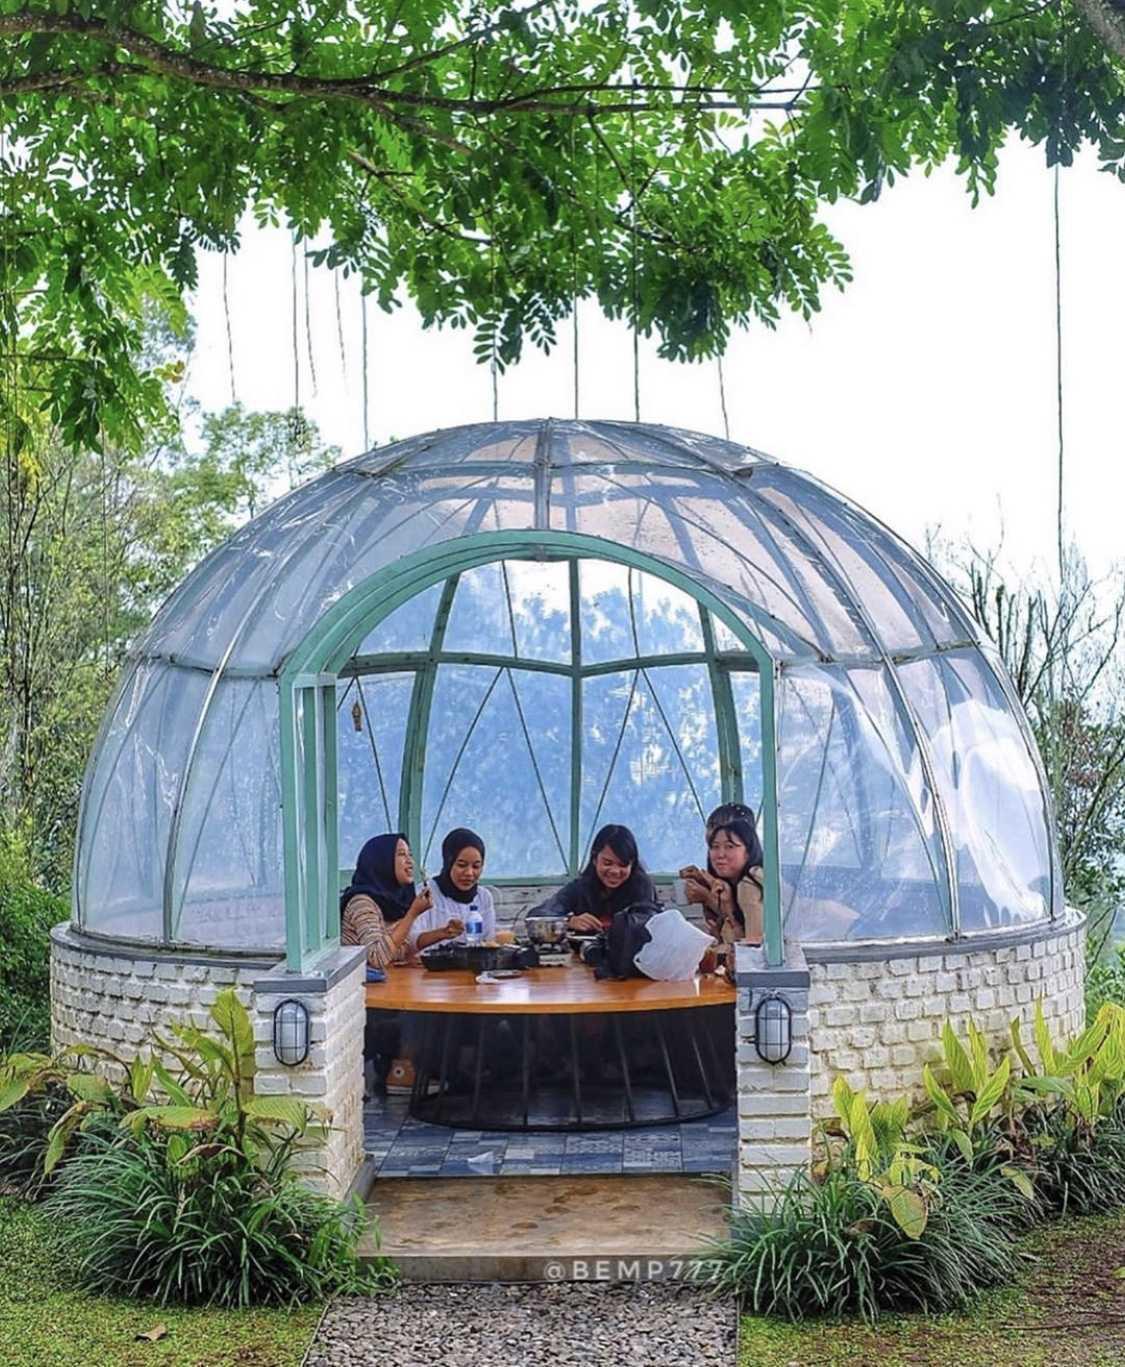 Wandi Uwa Krisdian Utara Cafe Ciburial, Kec. Cimenyan, Bandung, Jawa Barat 40198, Indonesia Ciburial, Kec. Cimenyan, Bandung, Jawa Barat 40198, Indonesia Wandi-Uwa-Krisdian-Utara-Cafe   73667